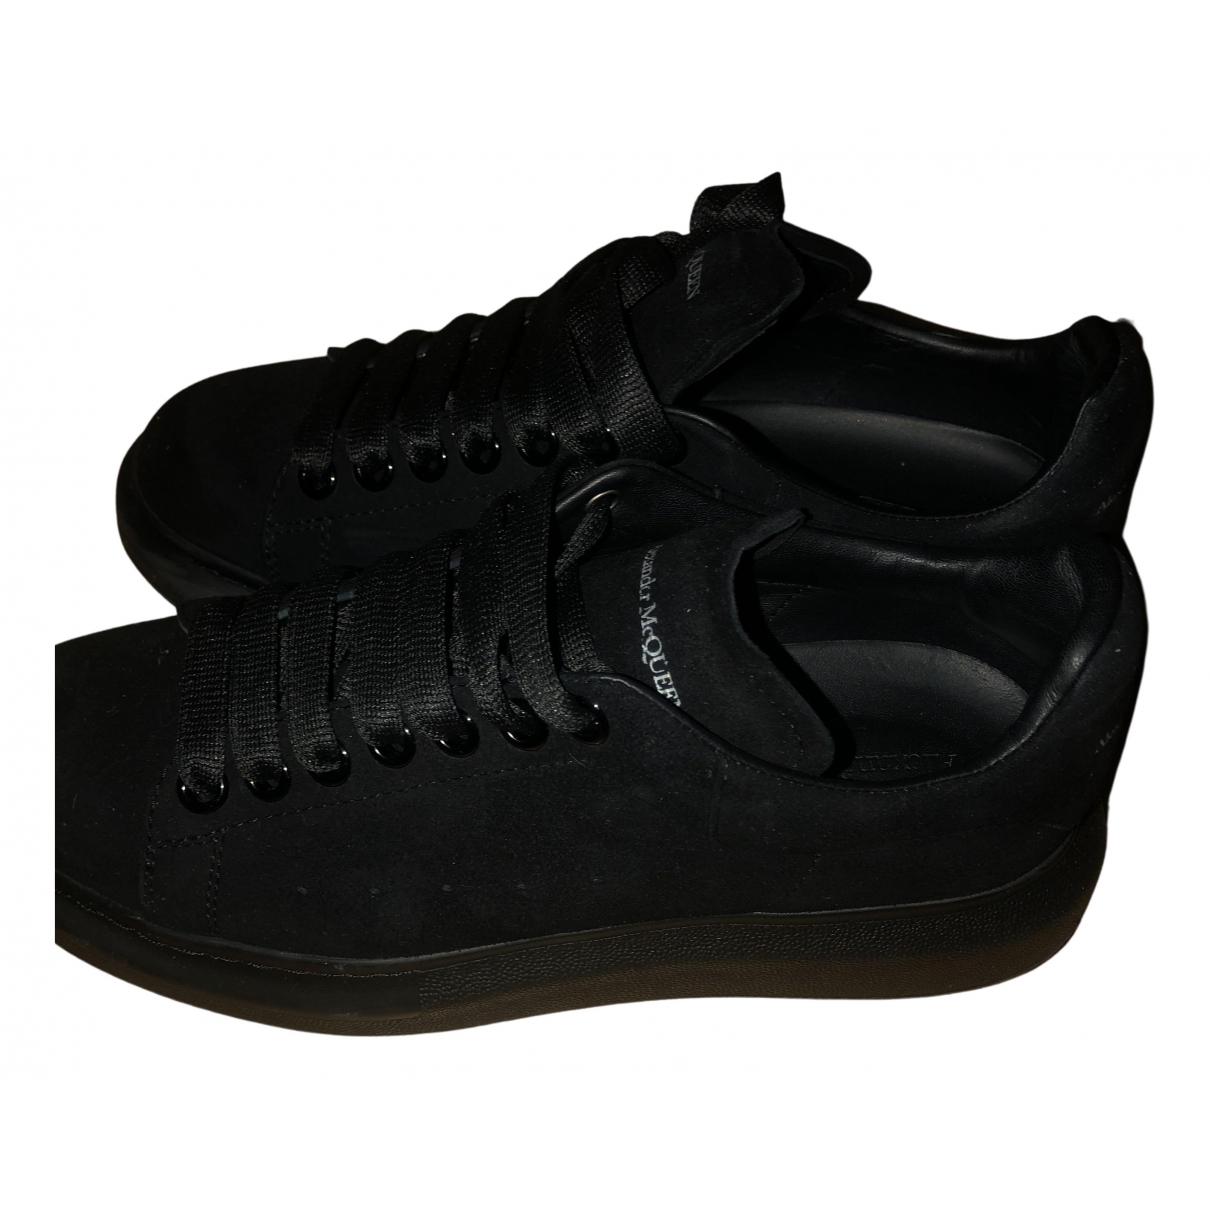 Alexander Mcqueen - Baskets Oversize pour femme en suede - noir